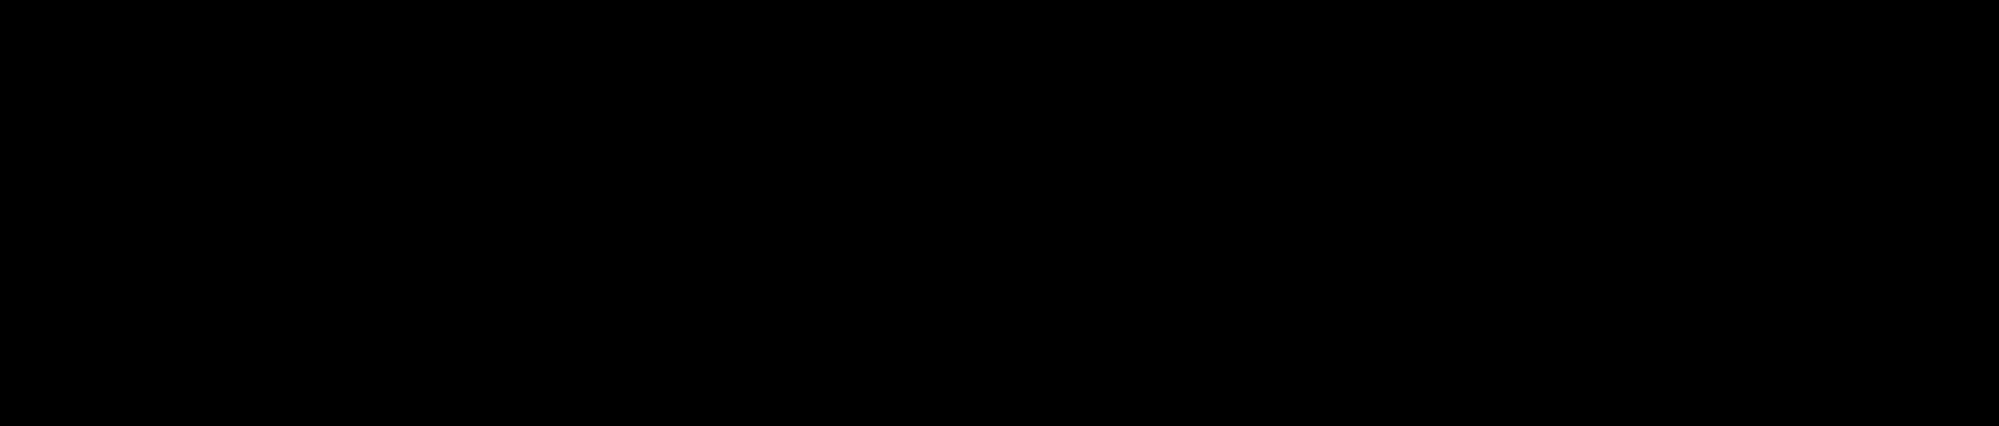 image167.png